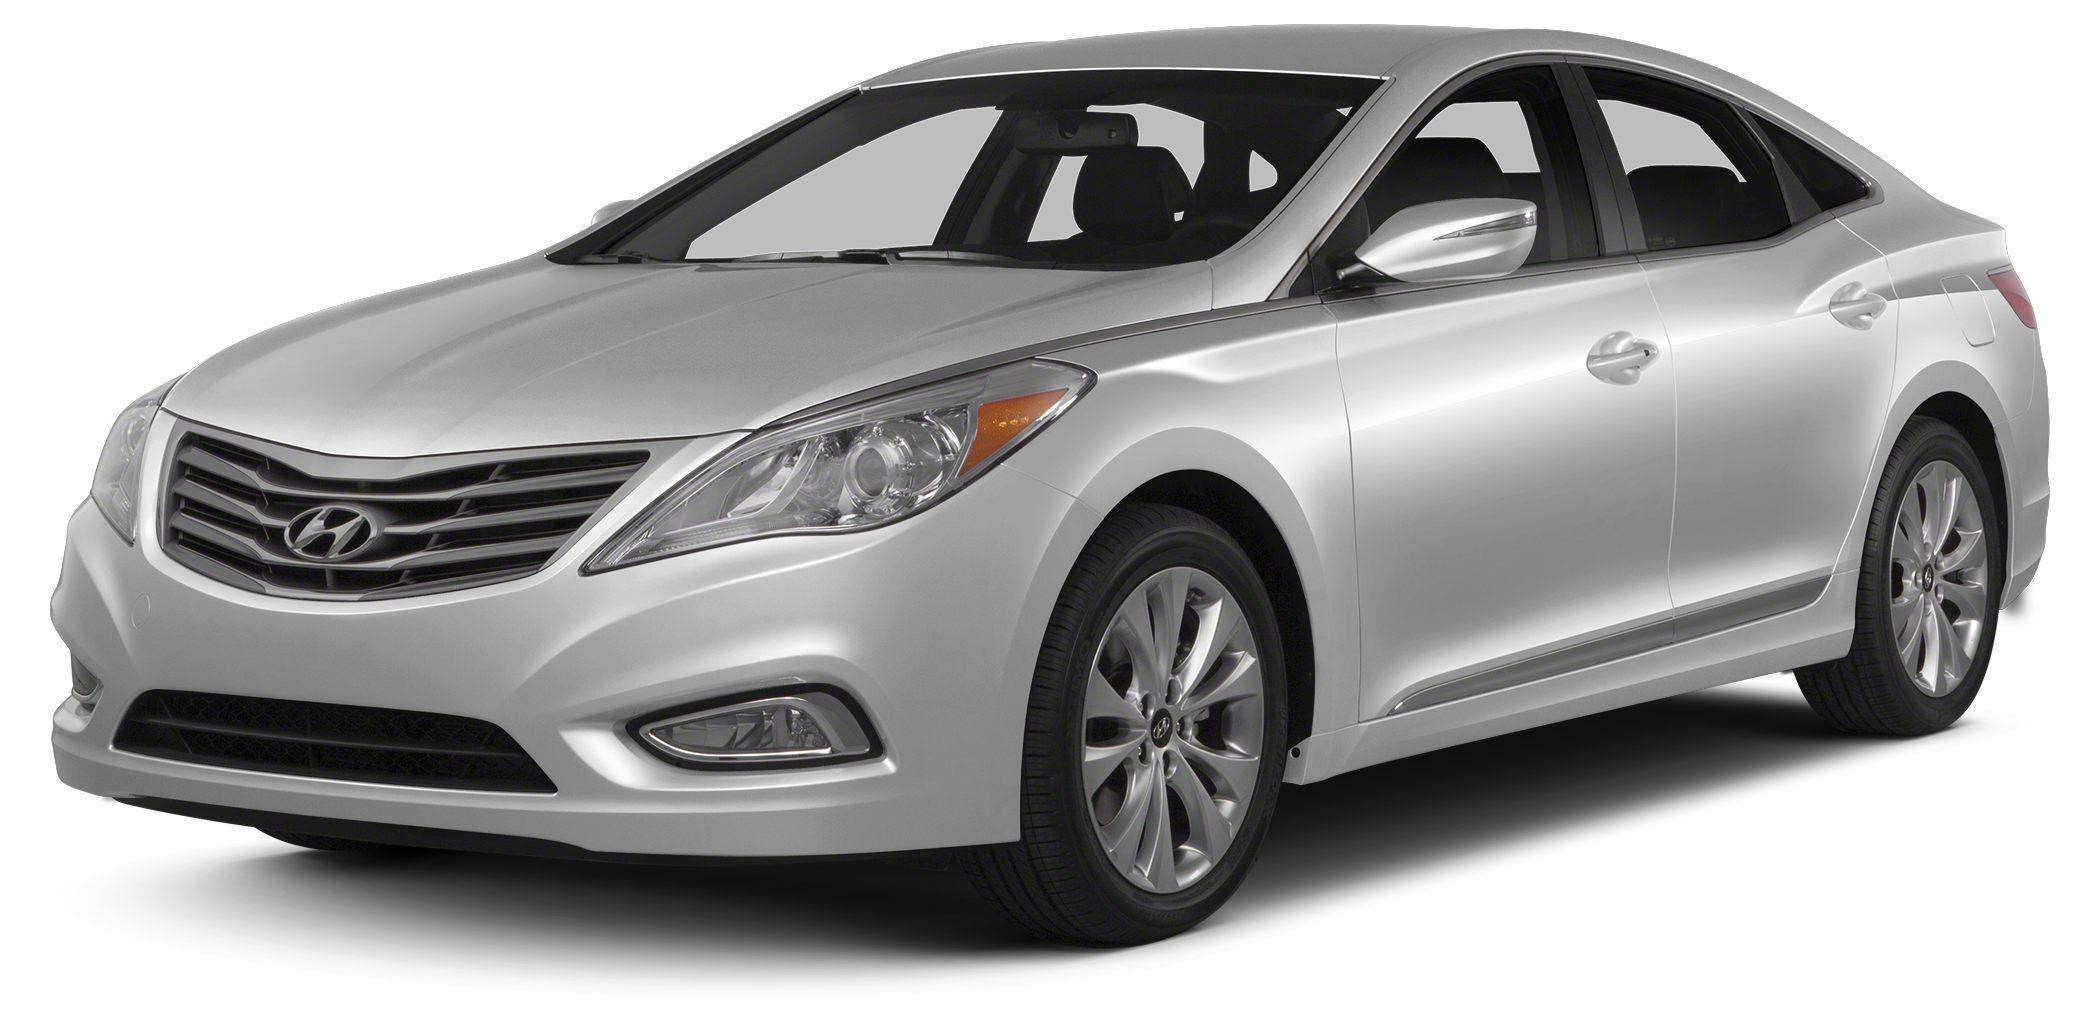 2012 Hyundai Azera Base Hyundais best kept secret WITH ONLY 16k MILES and Hyundai Certified thi